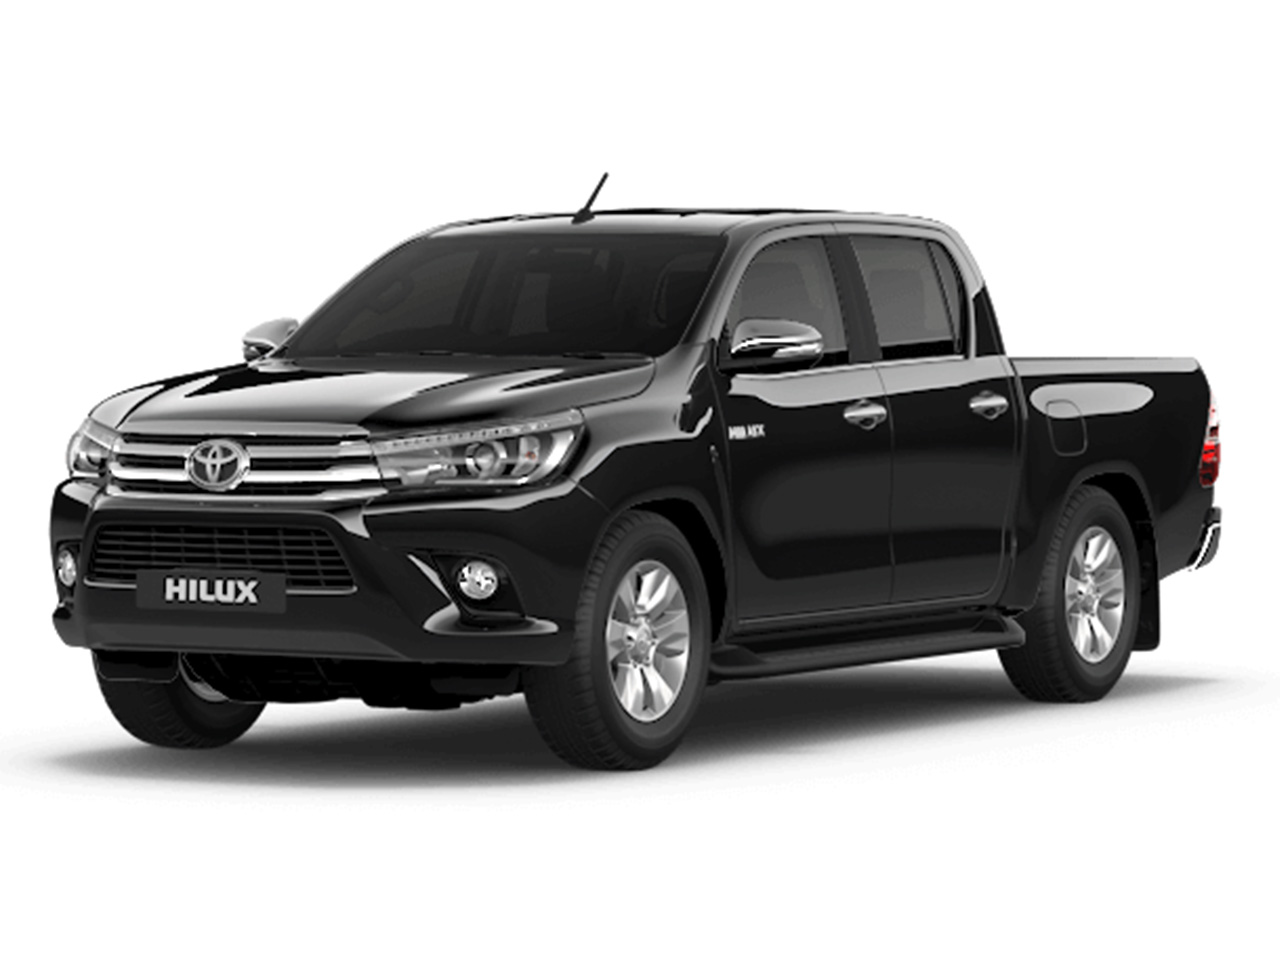 Toyota Hilux 2020 2.7L Double Cab GLX A/T (4x4), United Arab Emirates, 2019 pics migration